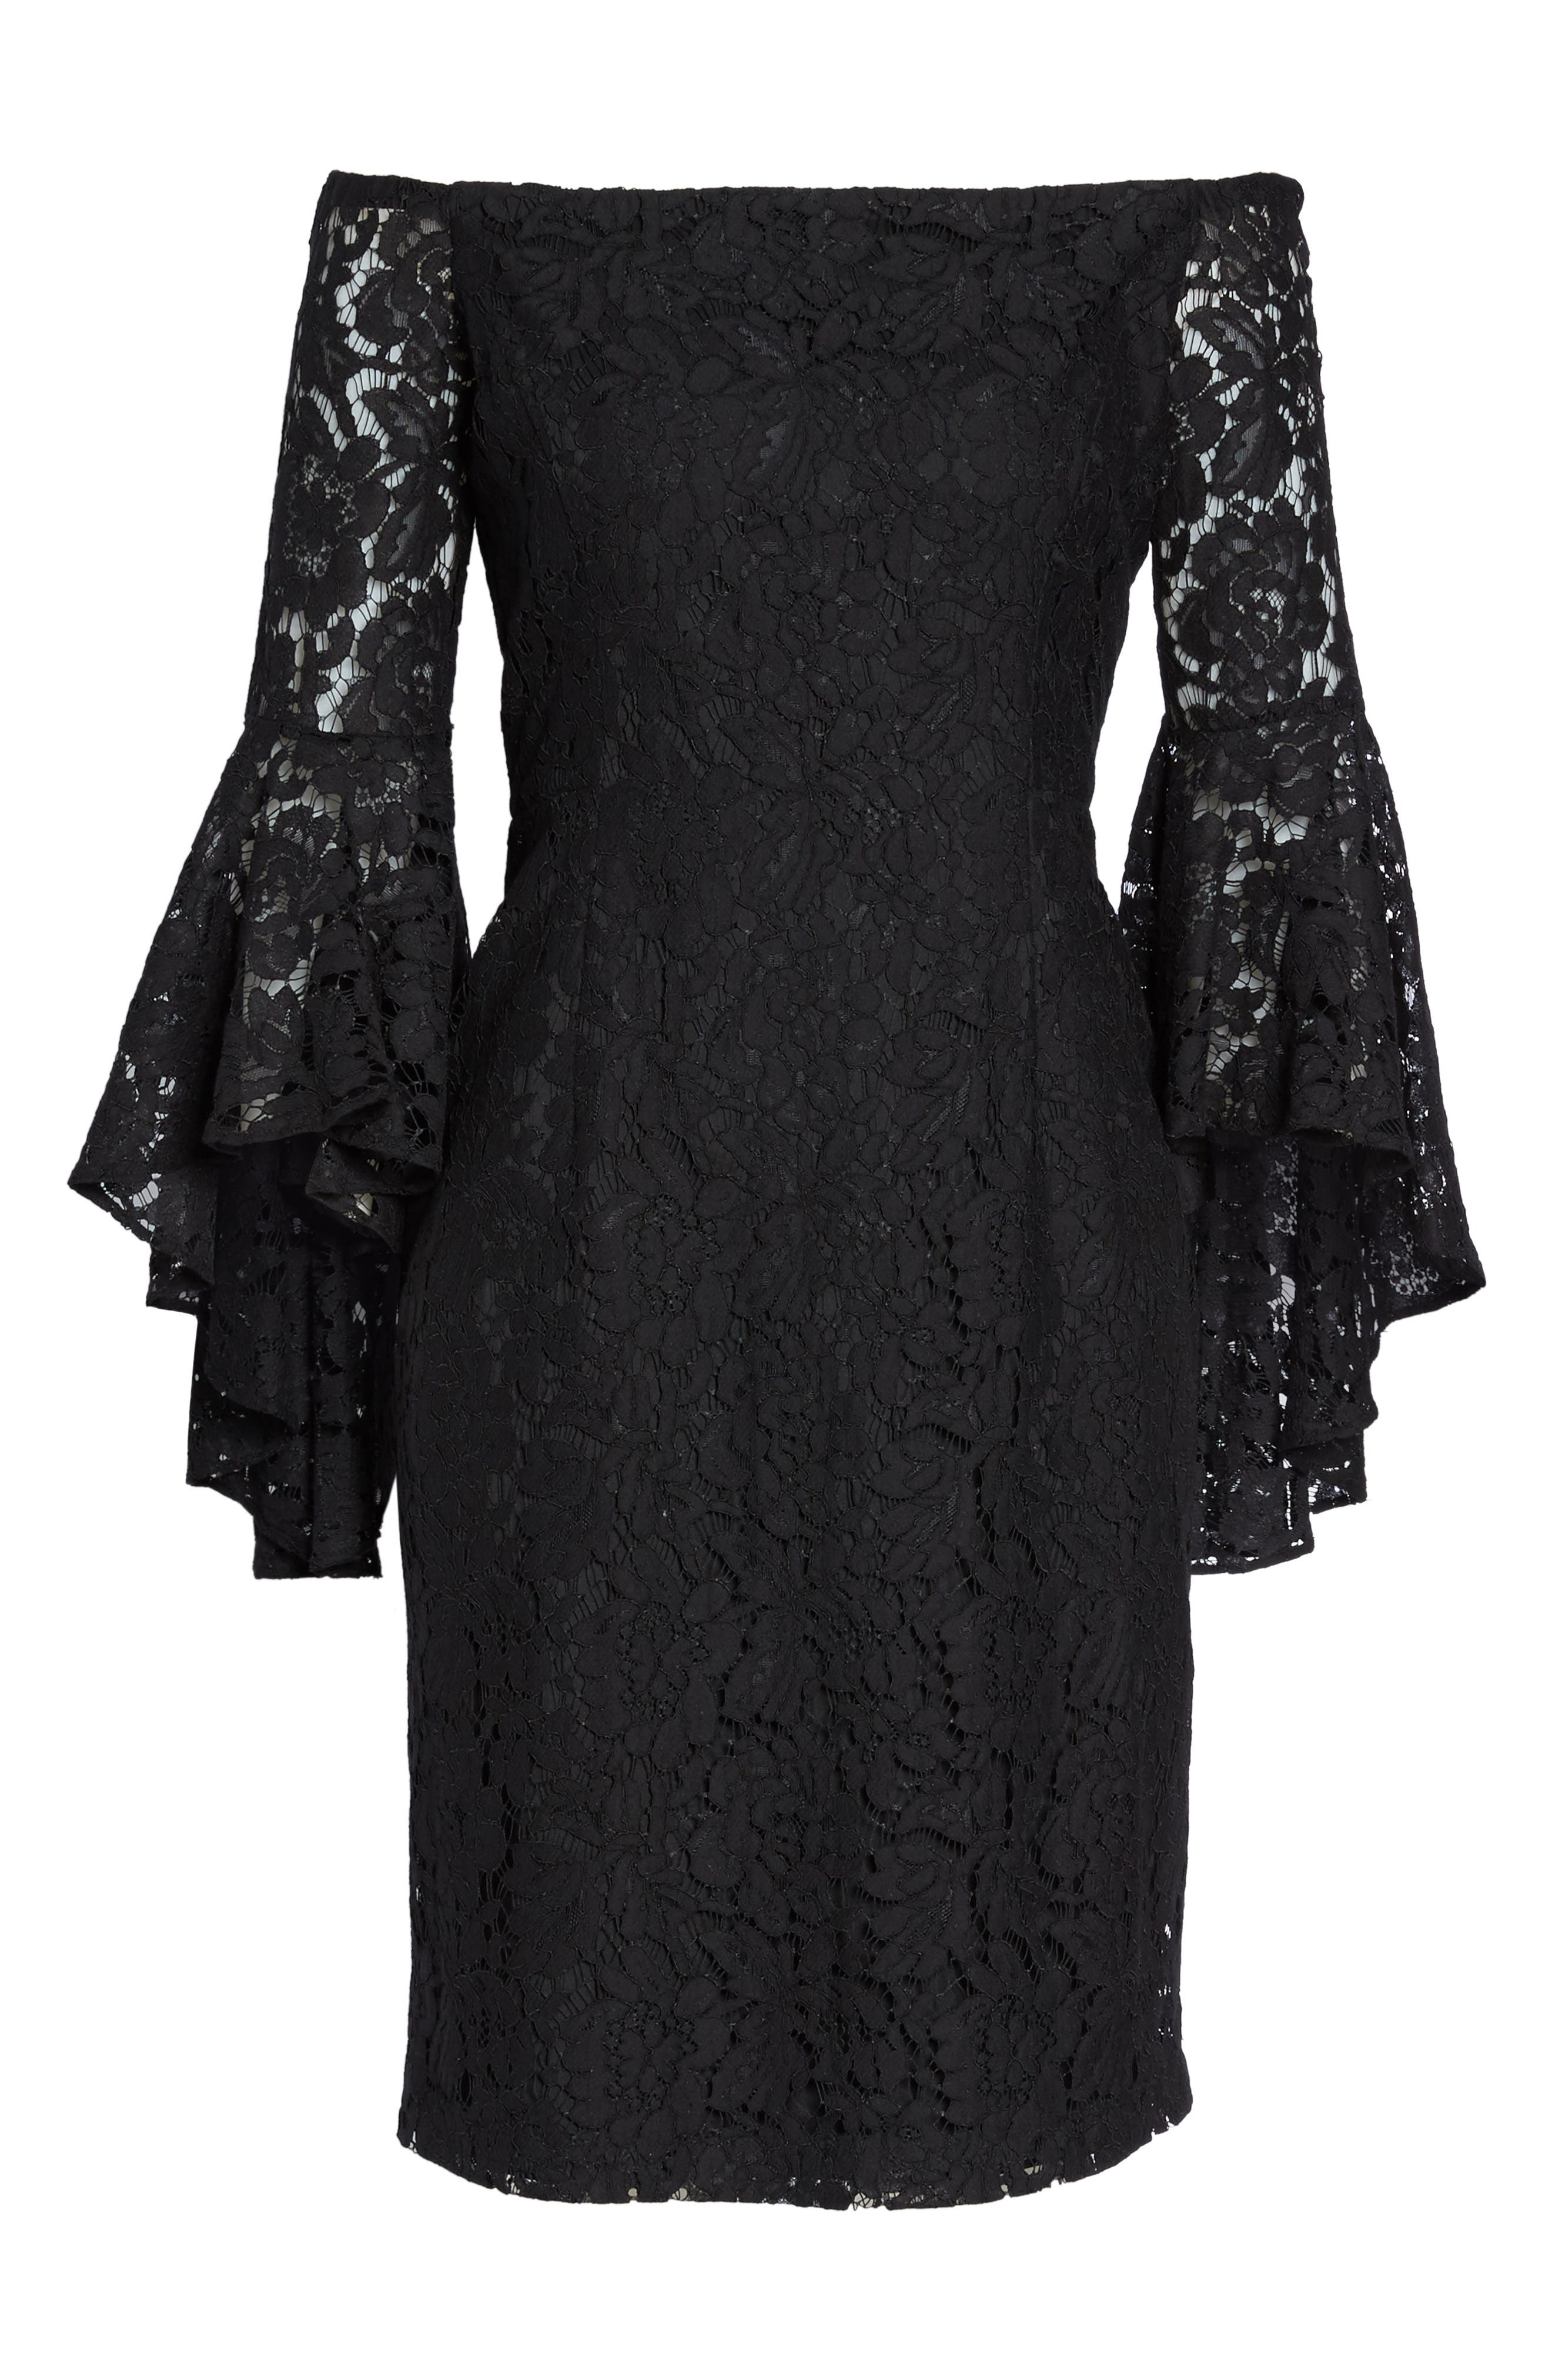 Off the Shoulder Lace Dress,                             Alternate thumbnail 6, color,                             001